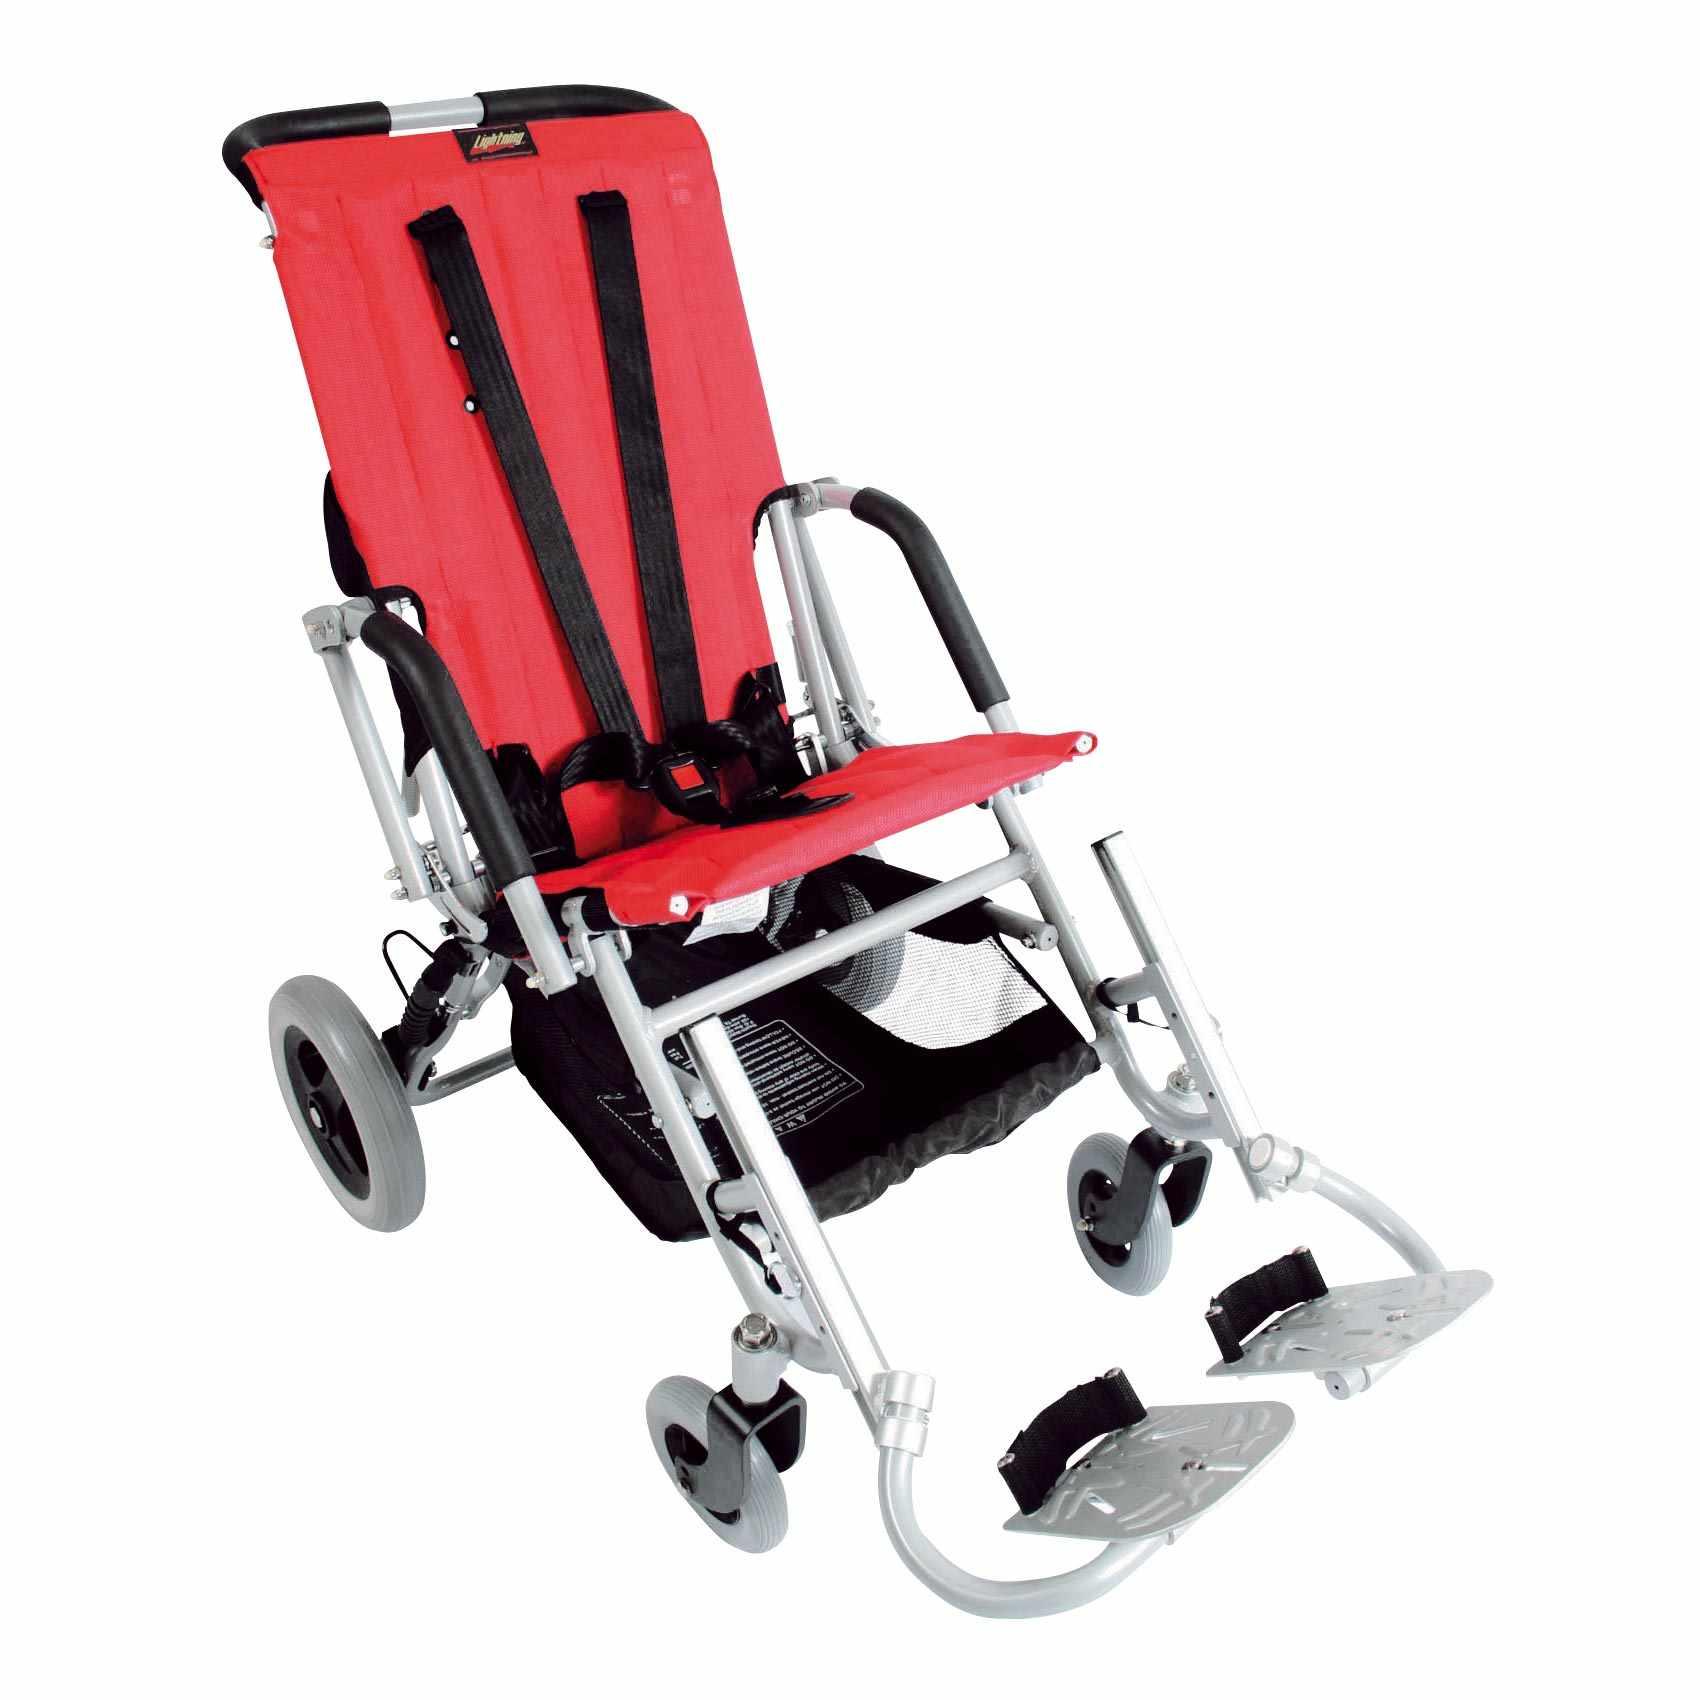 Stealth Lightning Standard Stroller